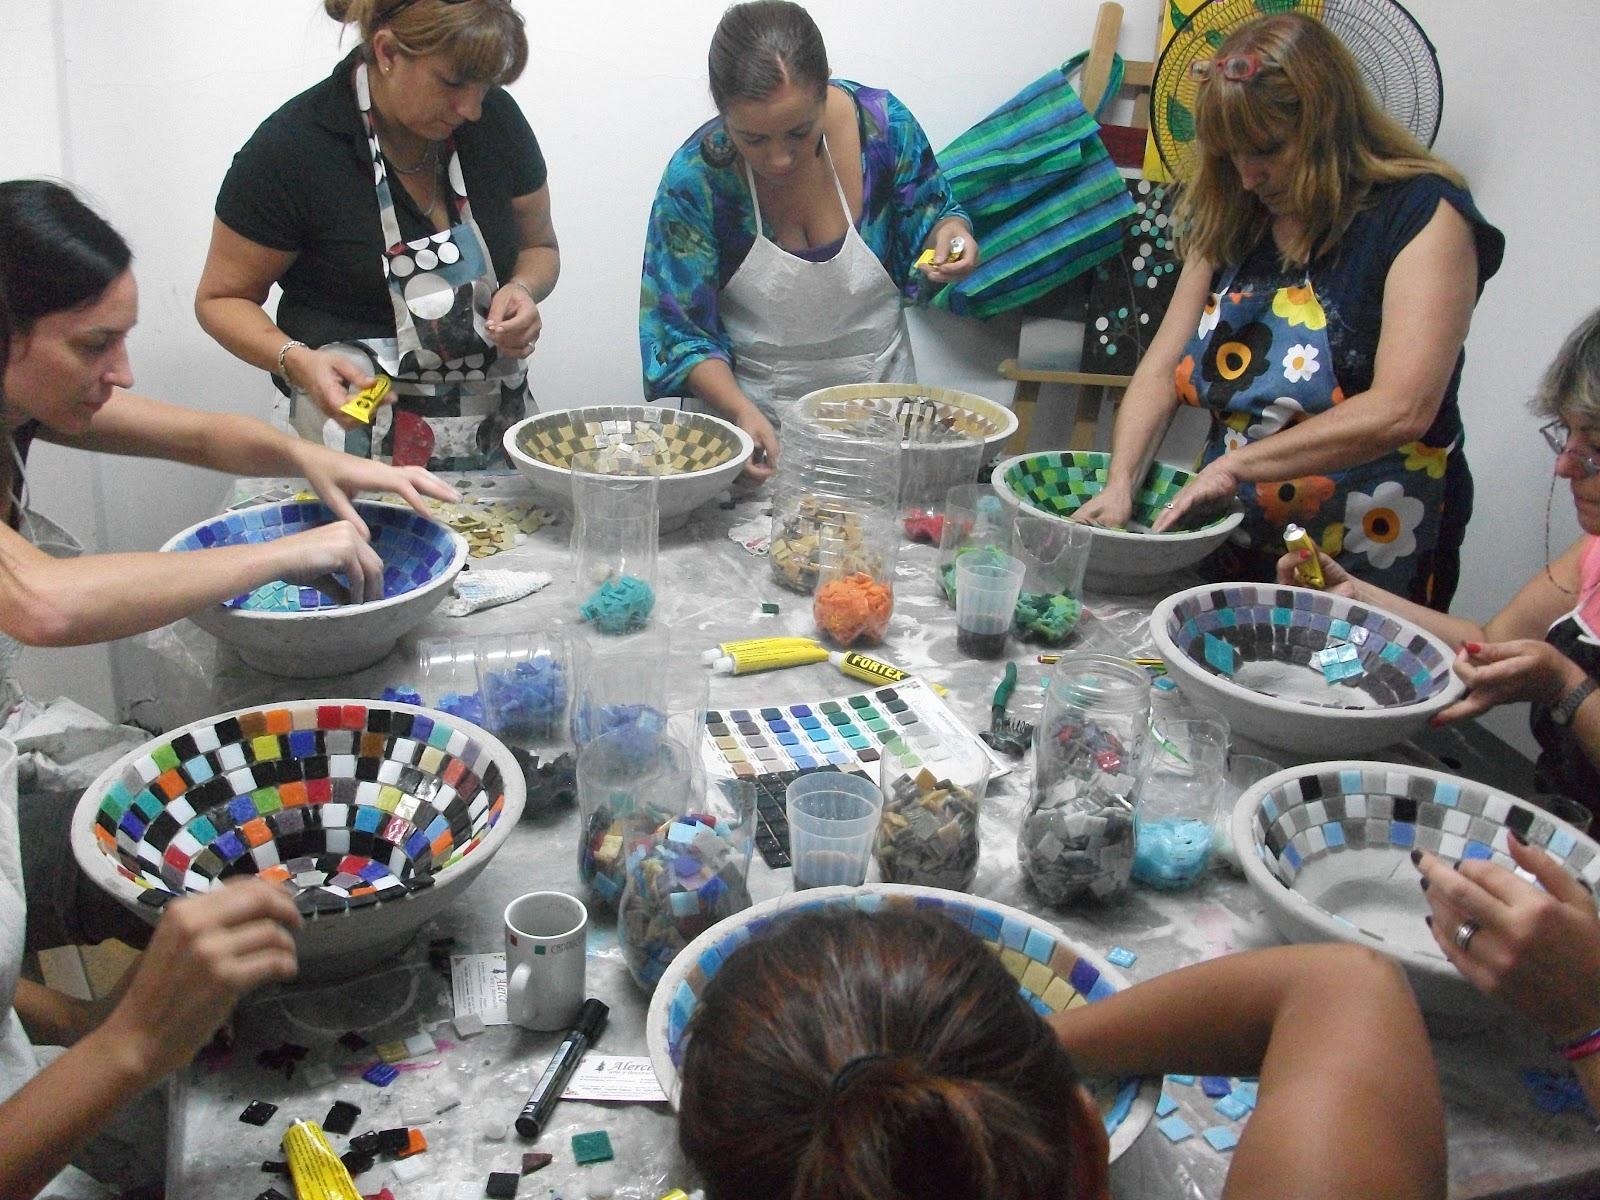 Decoracion De Baños Con Venecitas: Mosaiquismo: SABADO 11 FEBRERO TALLER DE BACHAS DE BAÑO CON VENECITAS